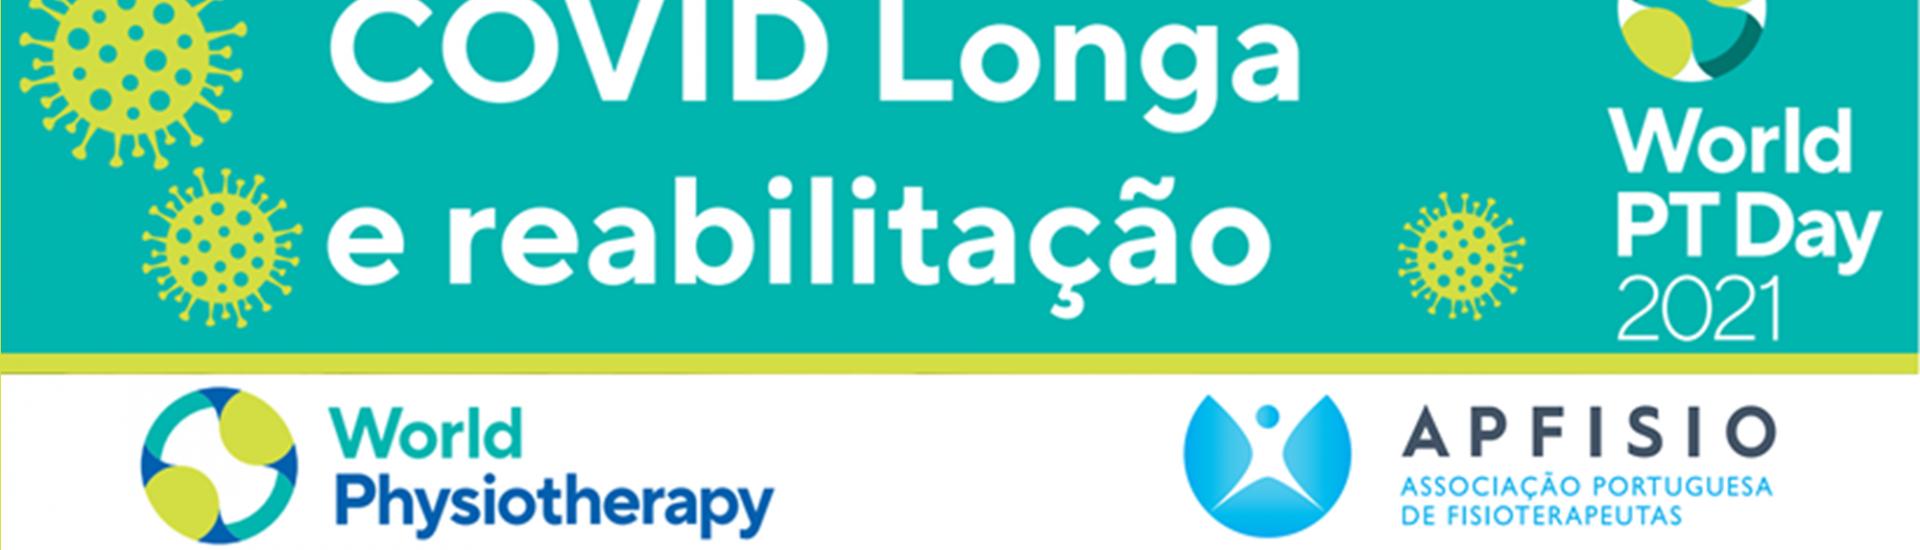 Dia Mundial da Fisioterapia (2021)